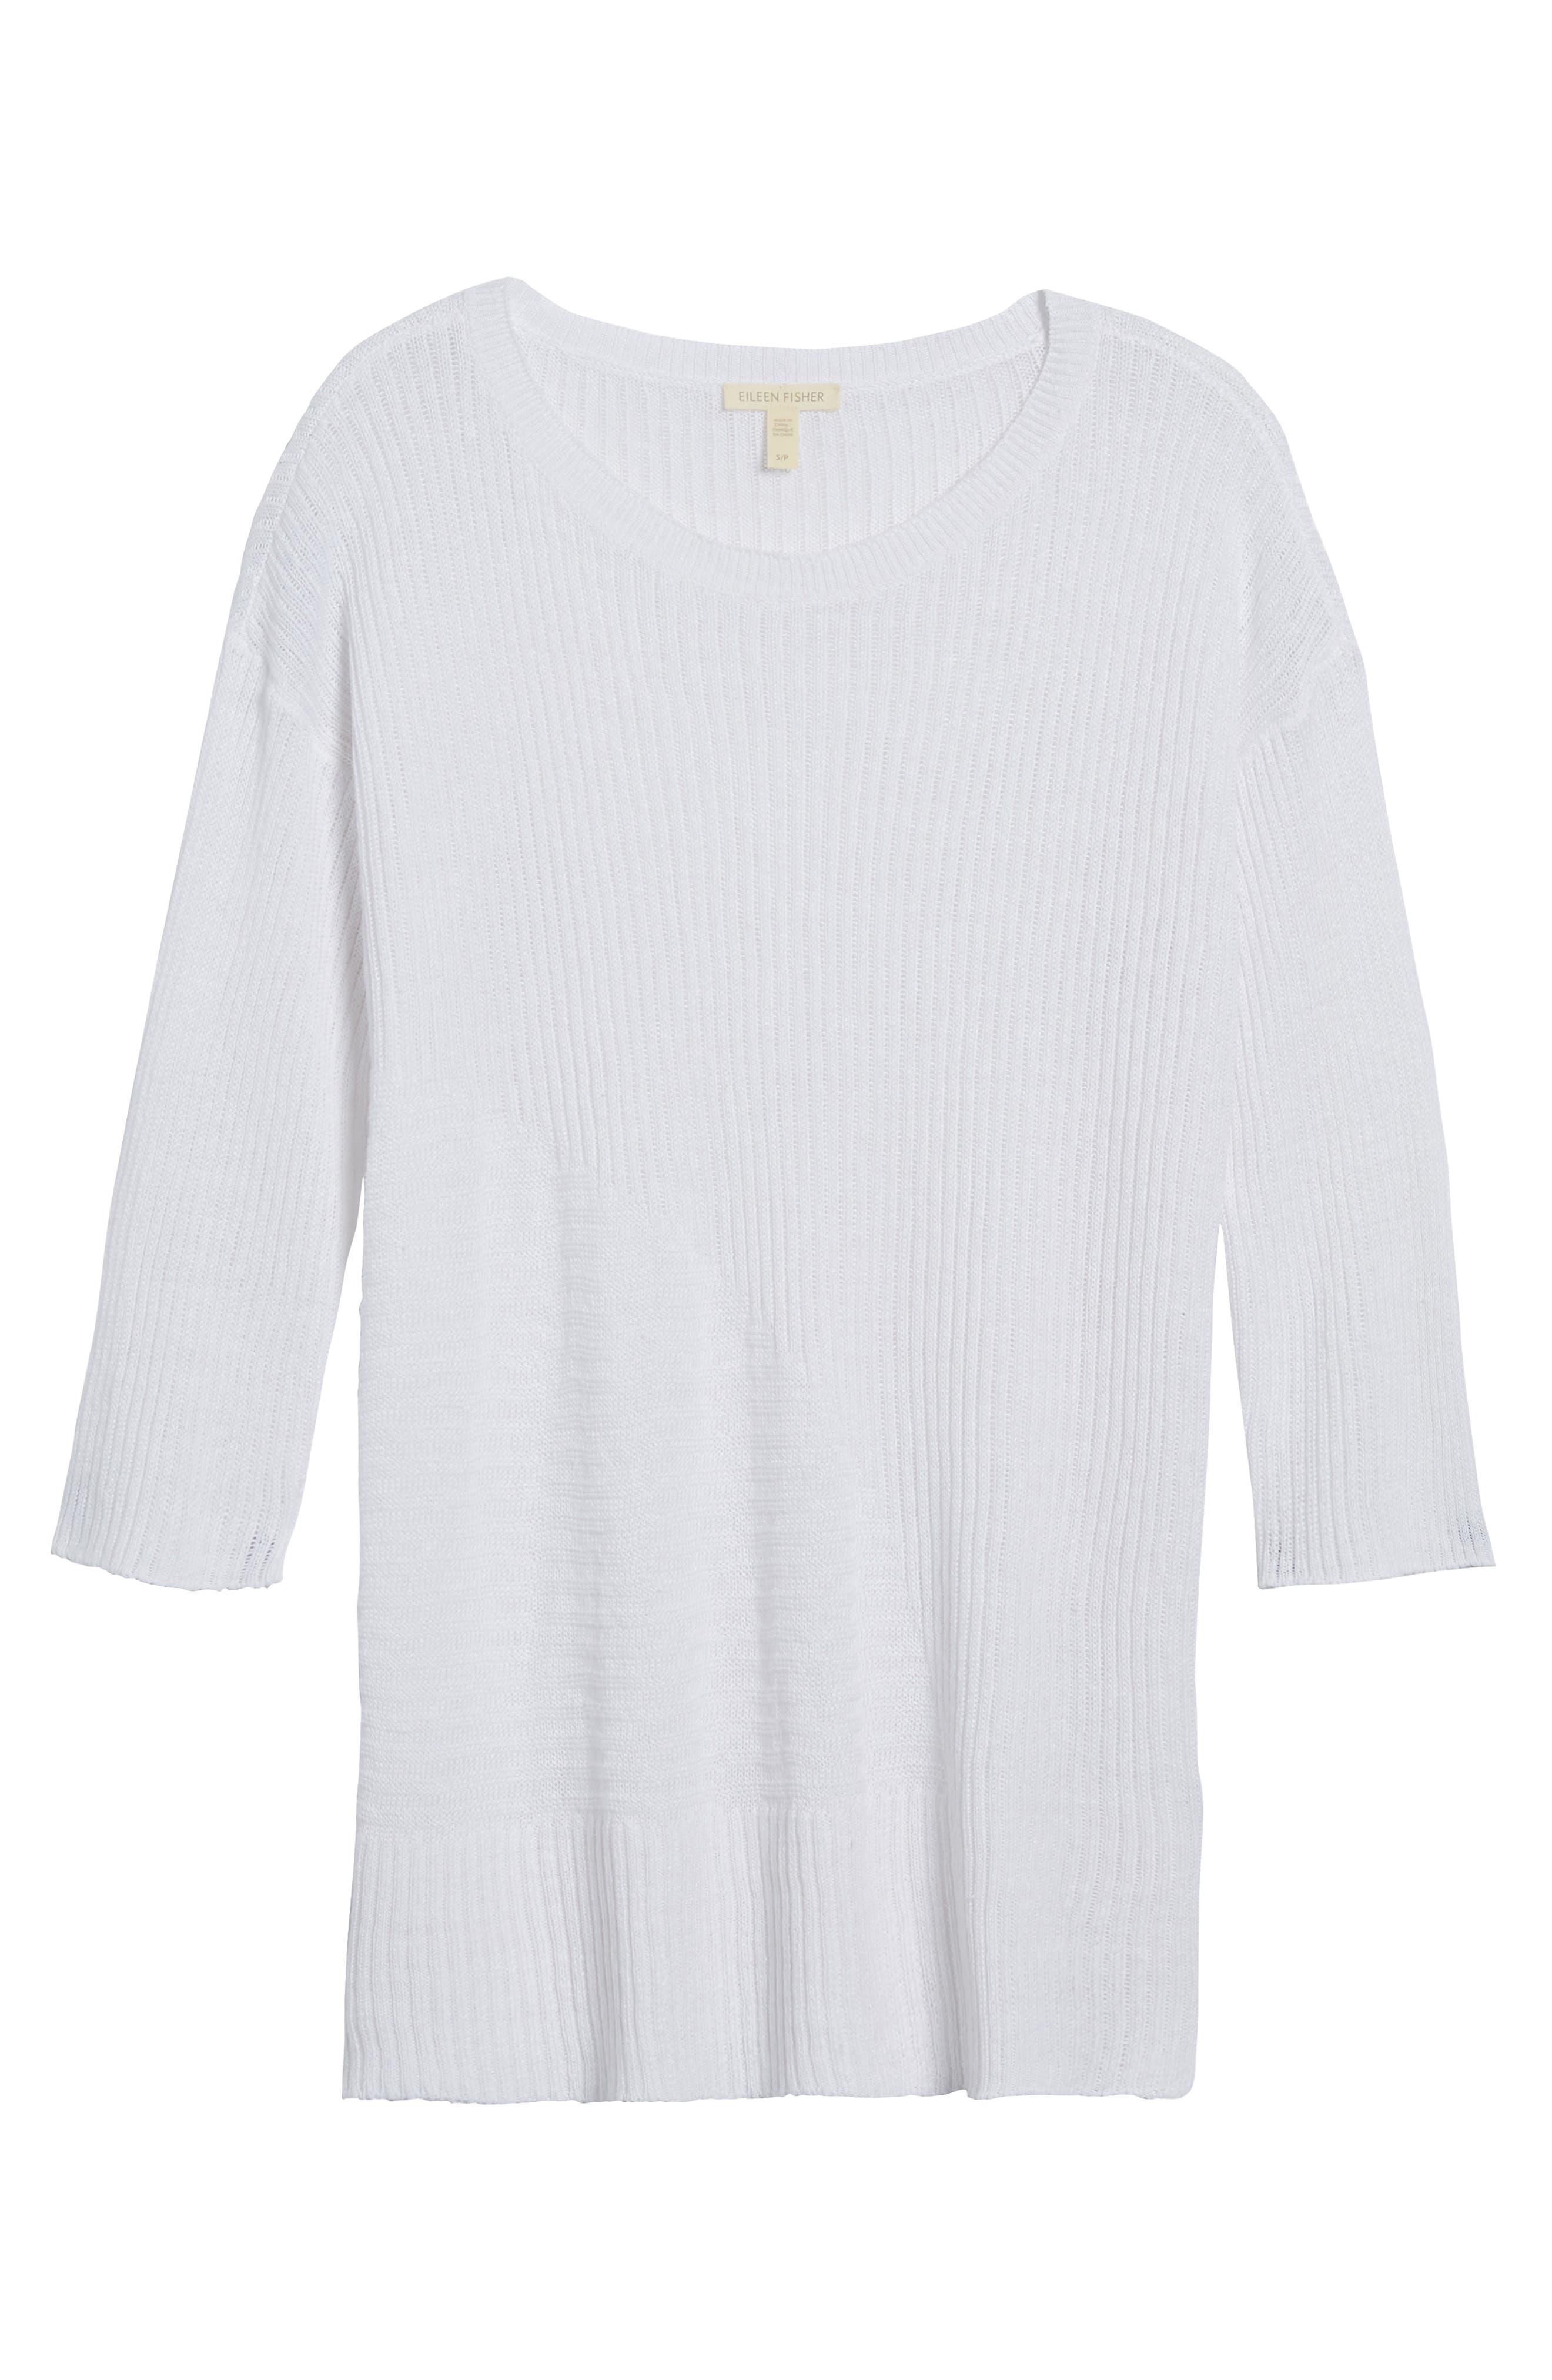 Organic Linen Tunic Sweater,                             Alternate thumbnail 6, color,                             100